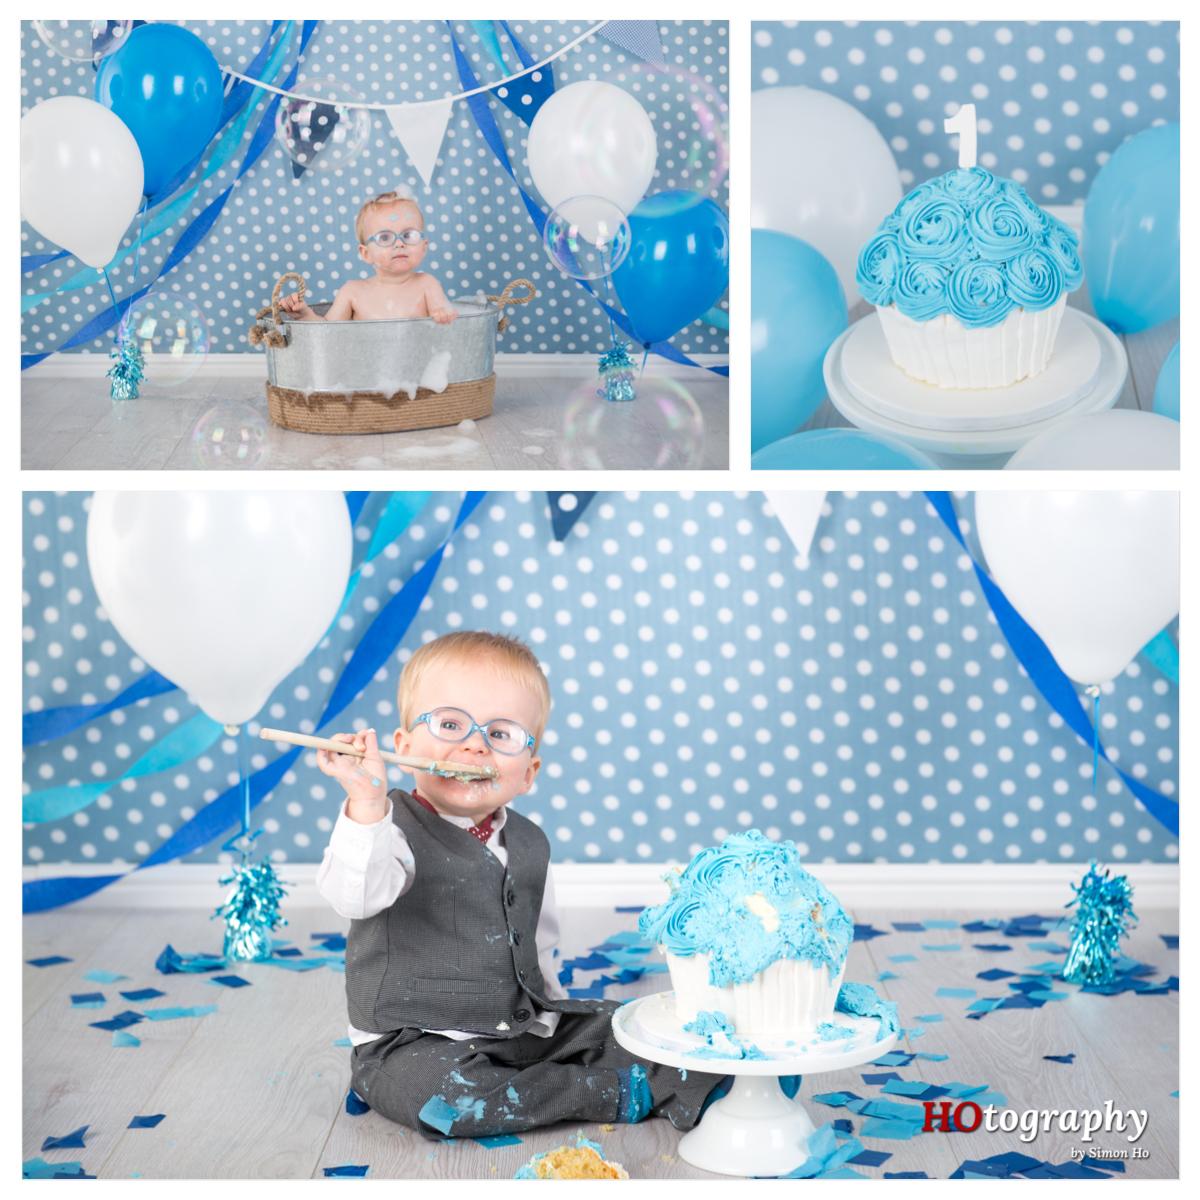 jacks cake smash2